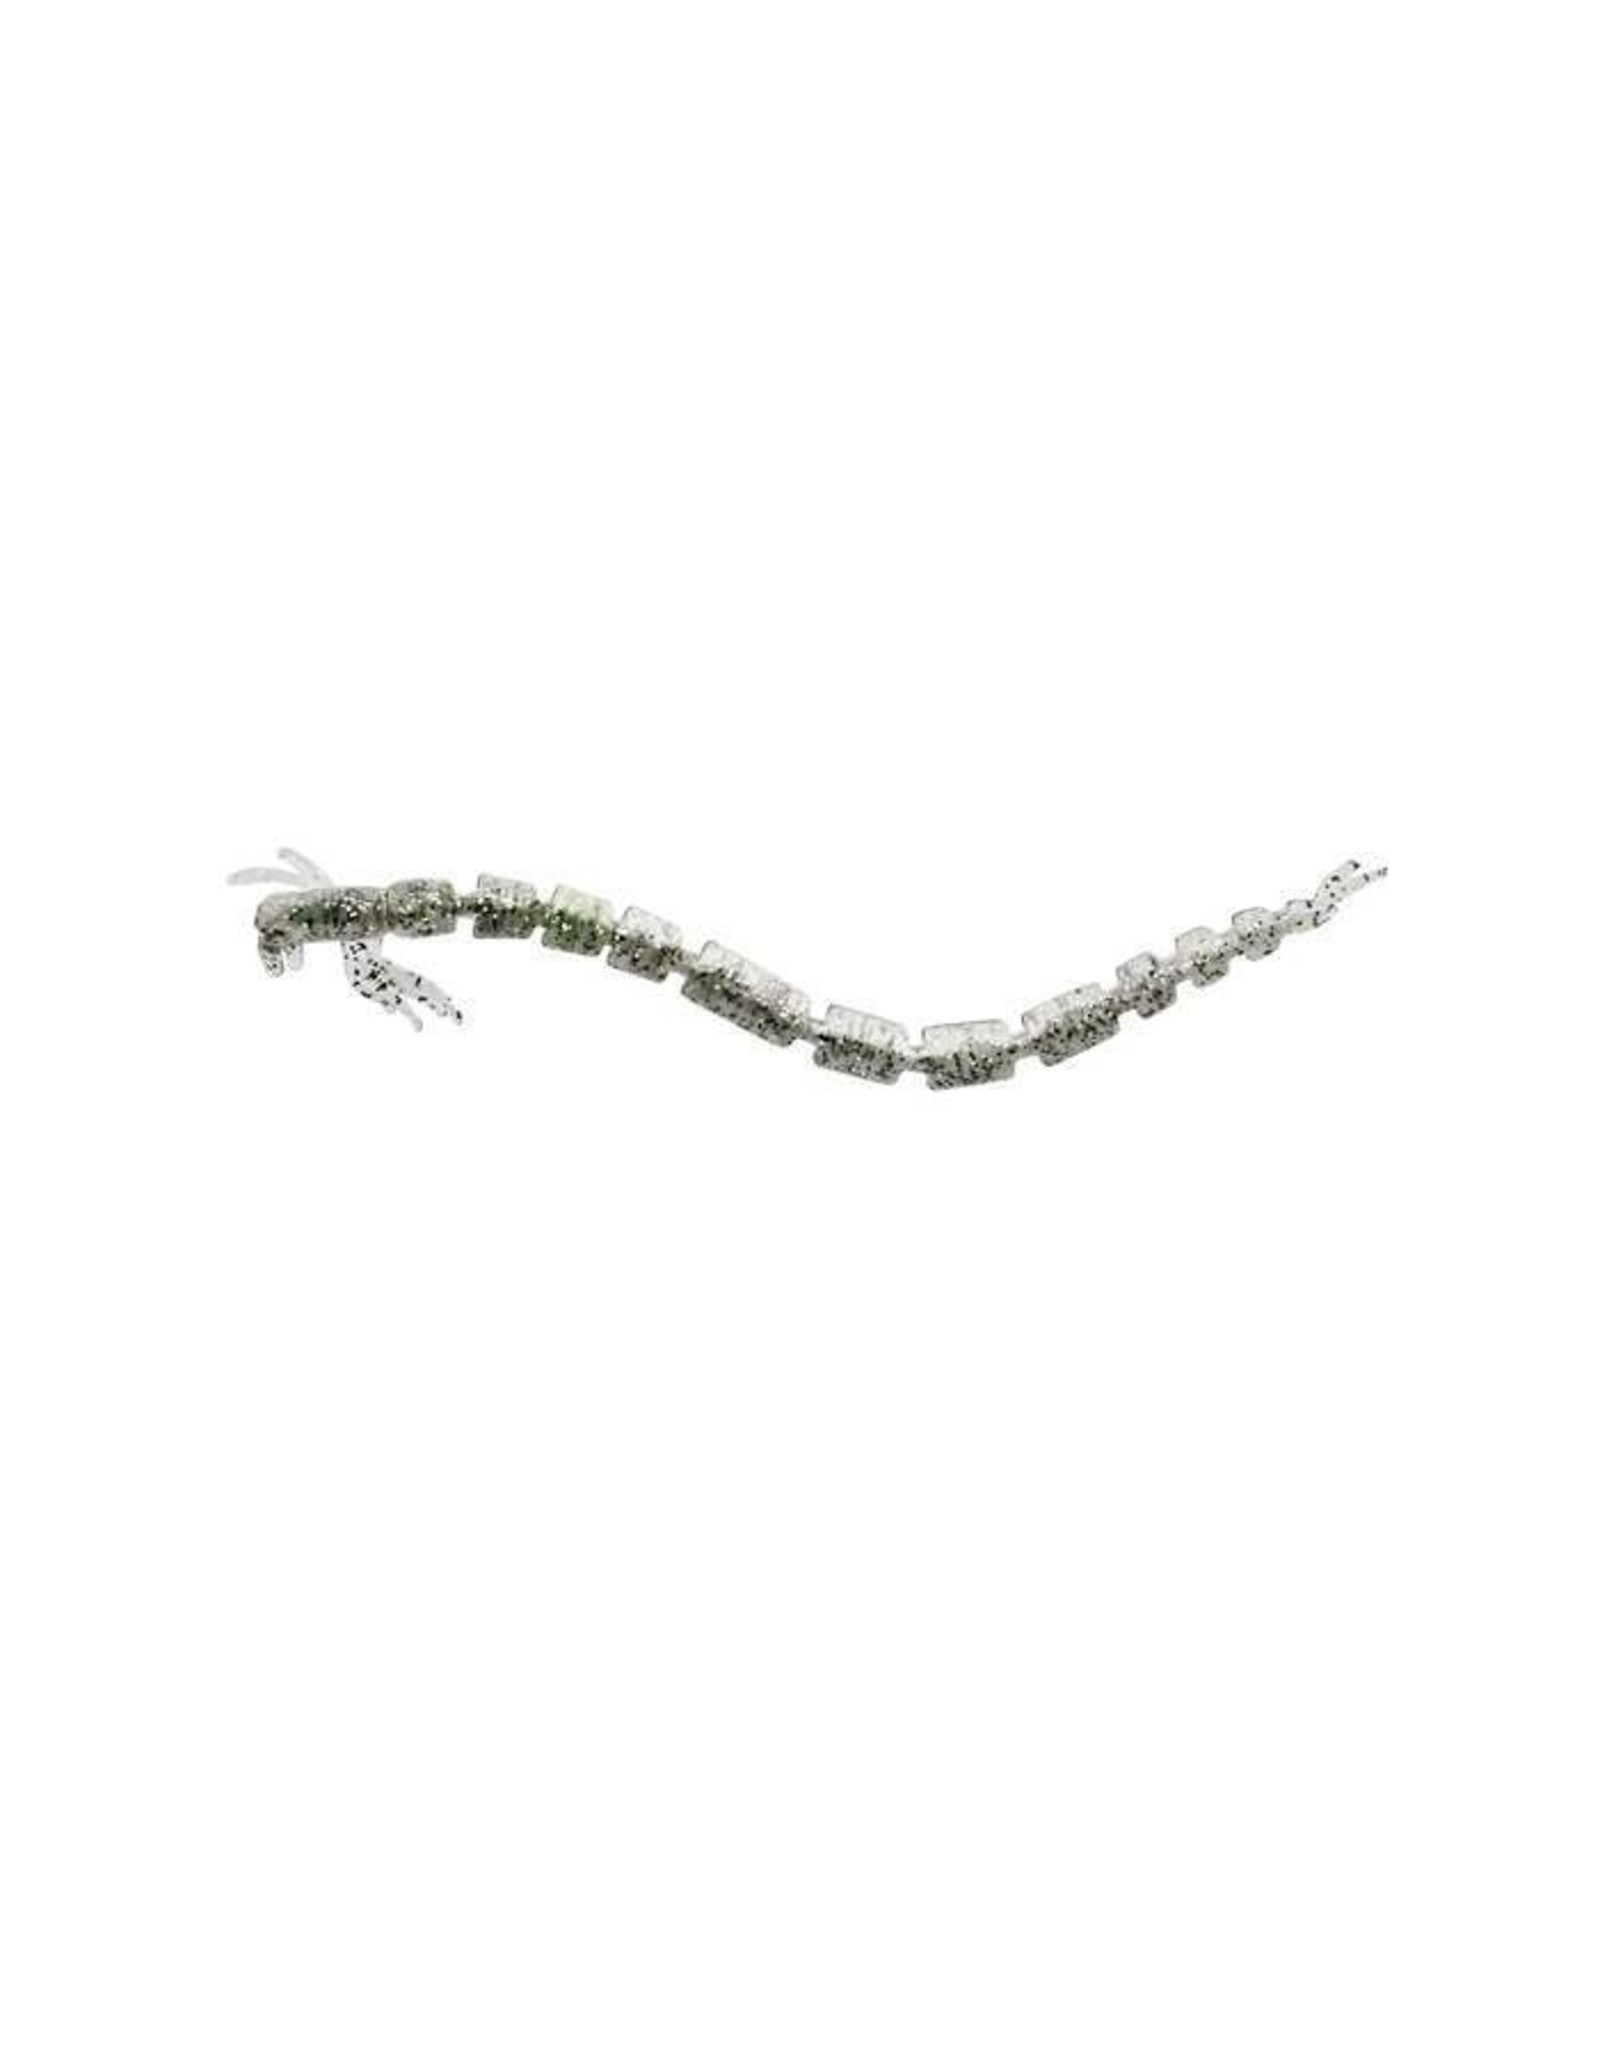 Westin BloodTeez 5,5 cm  Sparkling Grey 10-pack.